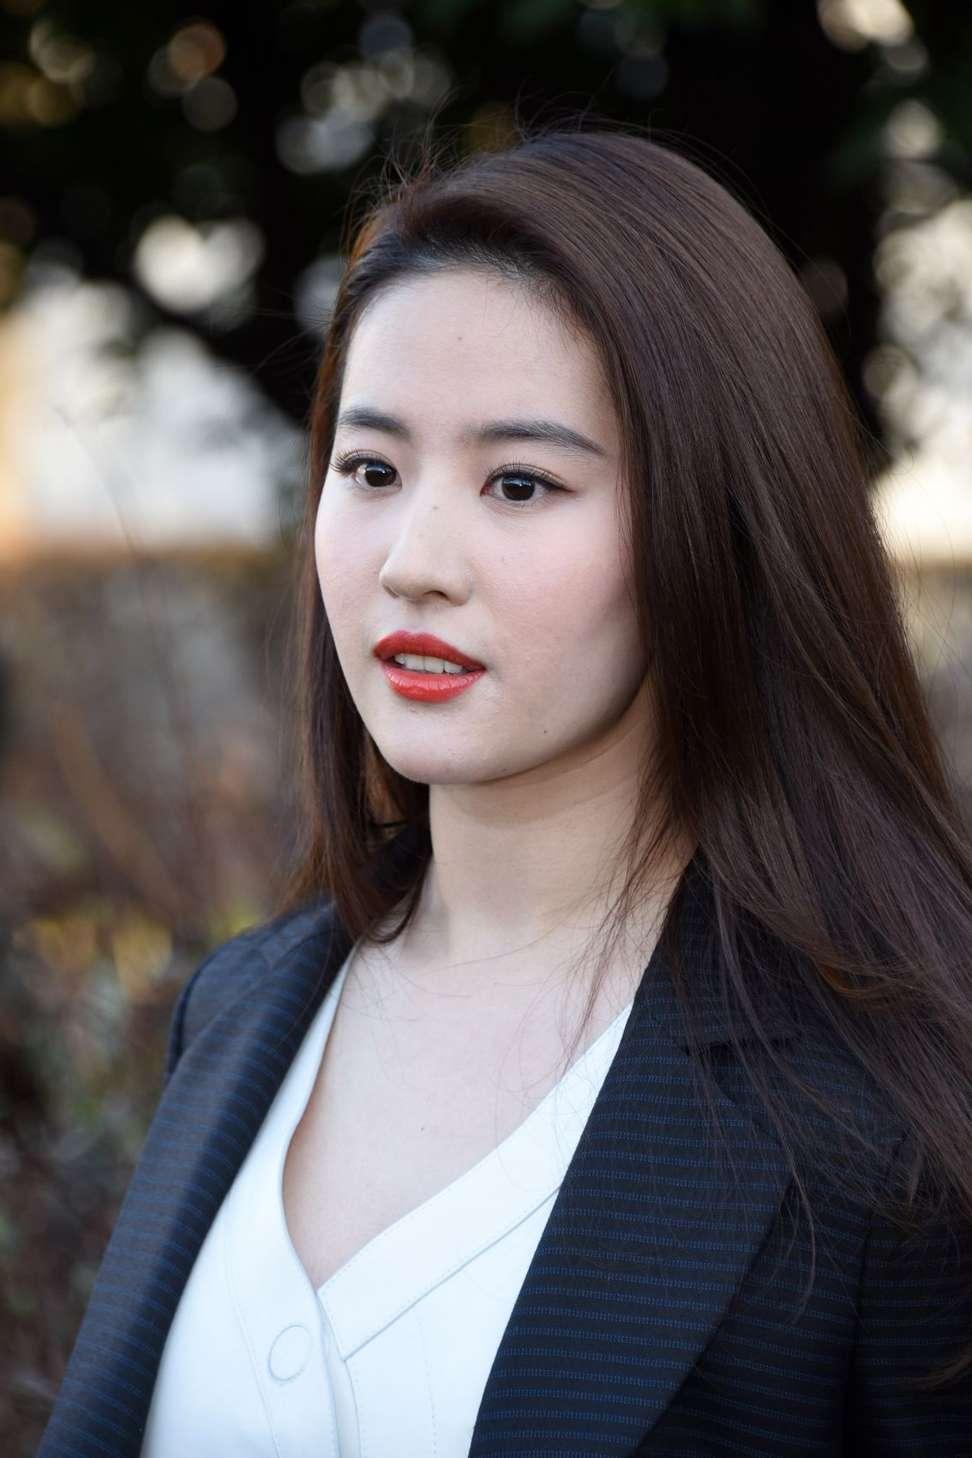 Liu Yifei nudes (39 photos), Pussy, Bikini, Twitter, bra 2015